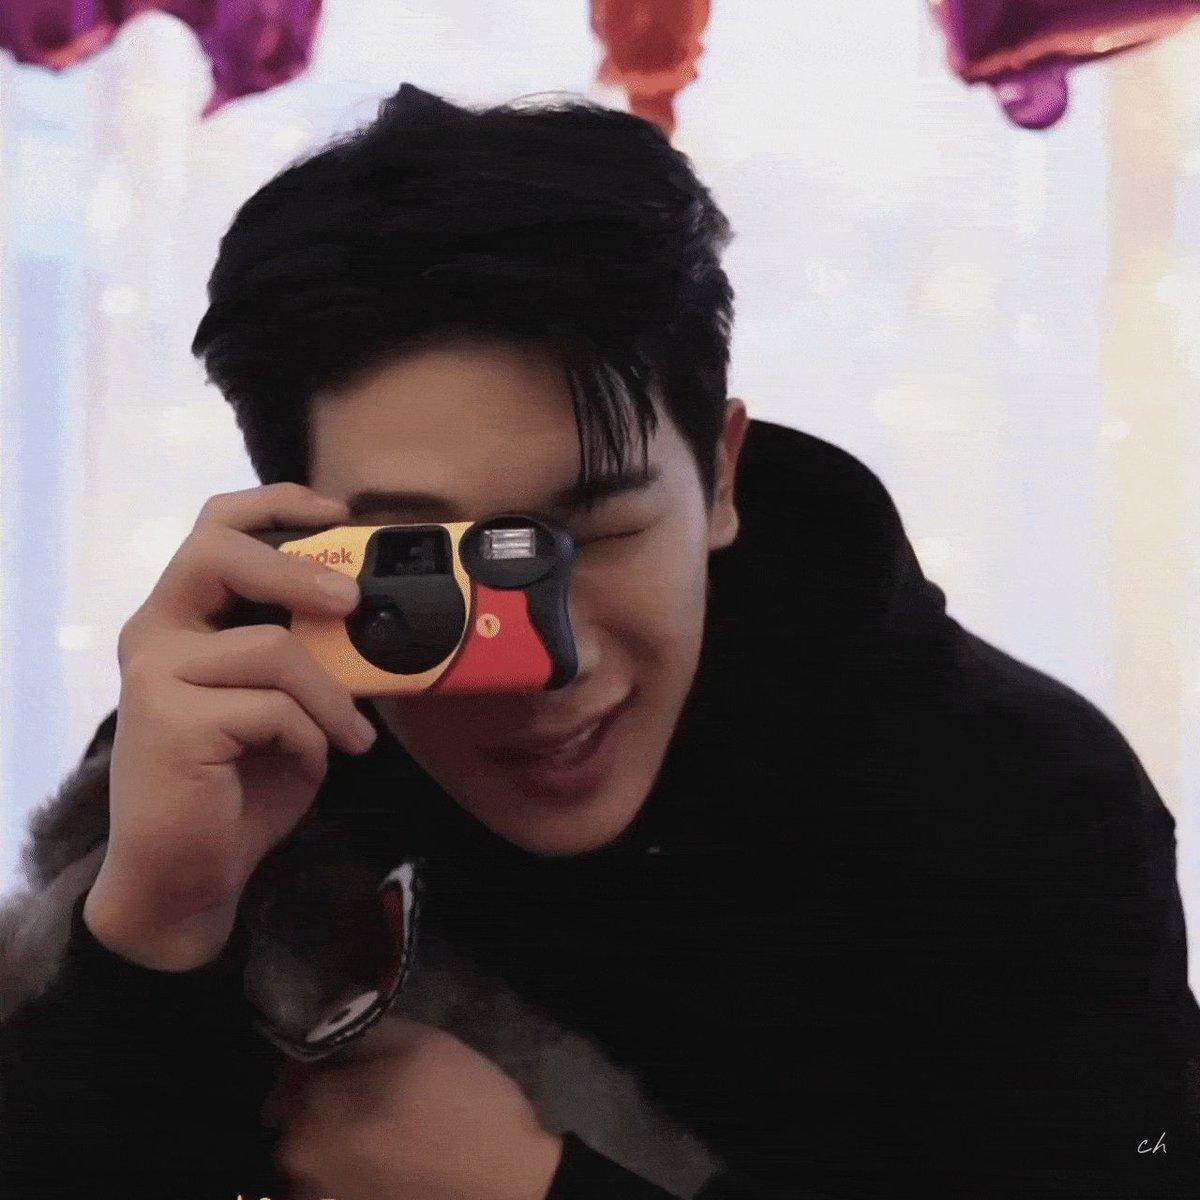 Un dato... ¿Sabían que también son las Monbebes de Wonho?  ¡¡¡Monsta X son 7!!! Asimismo no creen que falta en sus bellas selcas la etiqueta de él?? 😊 @official__wonho @OfficialMonstaX